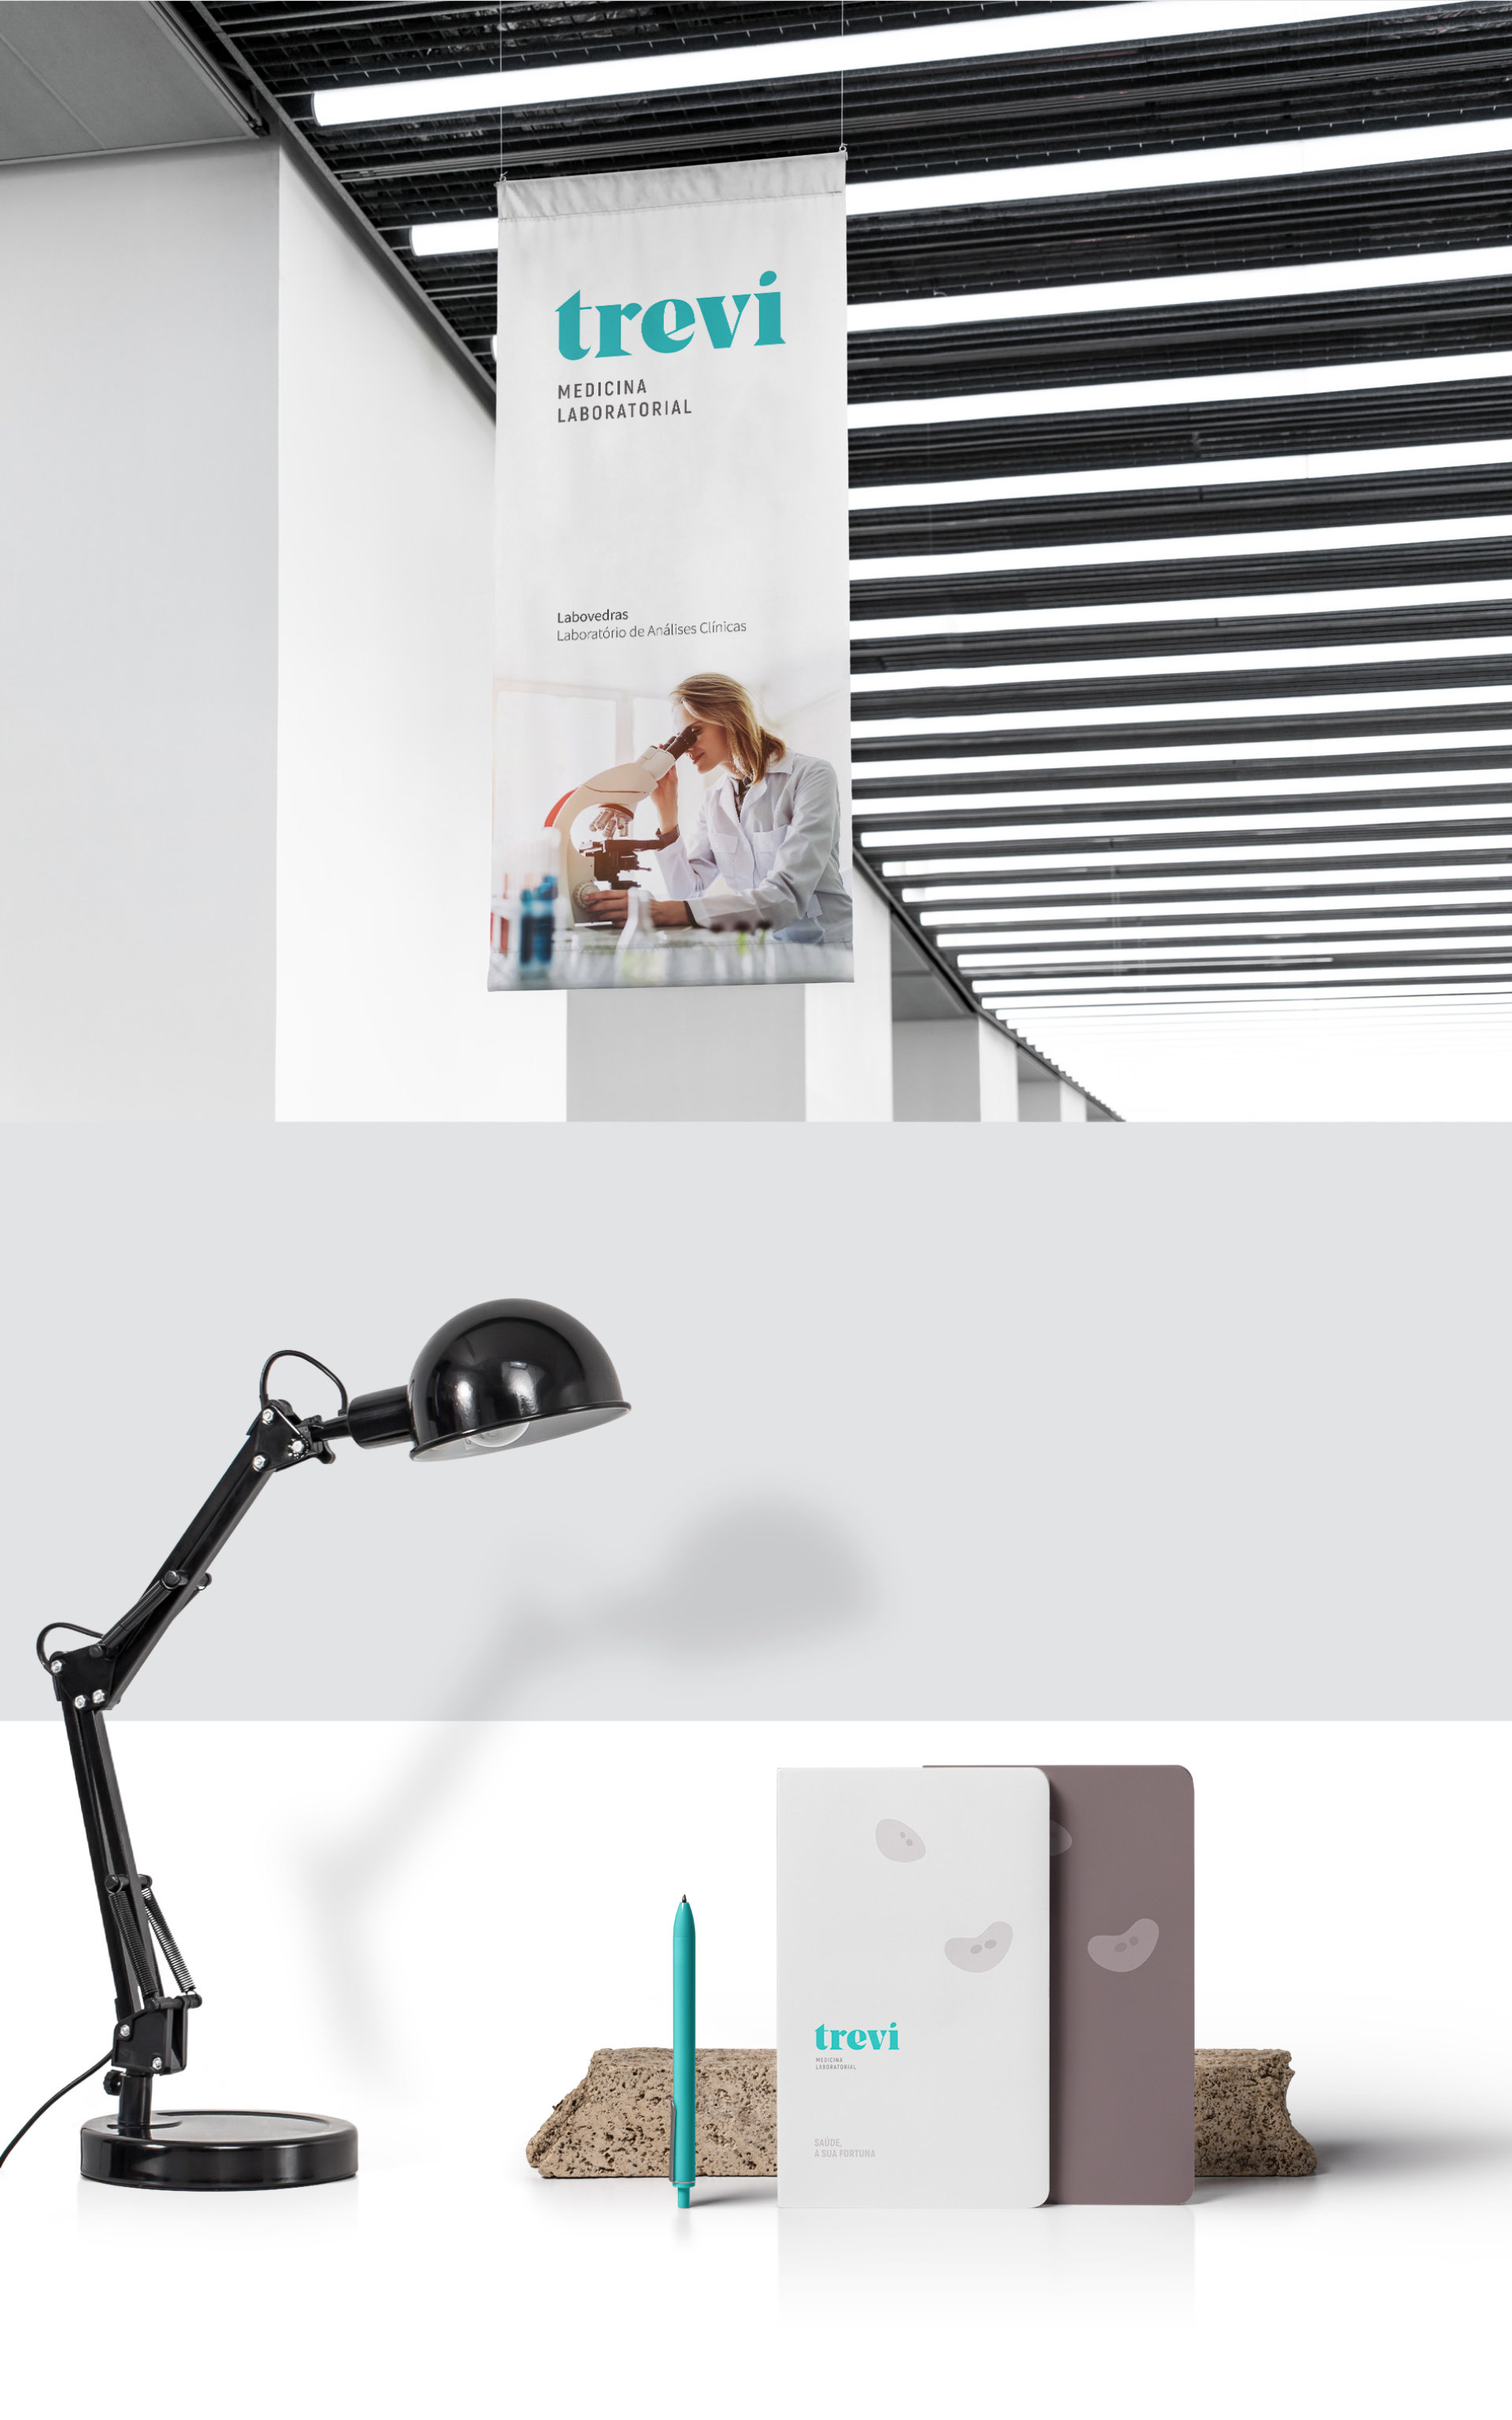 Trevi | Medicina Laboratorial